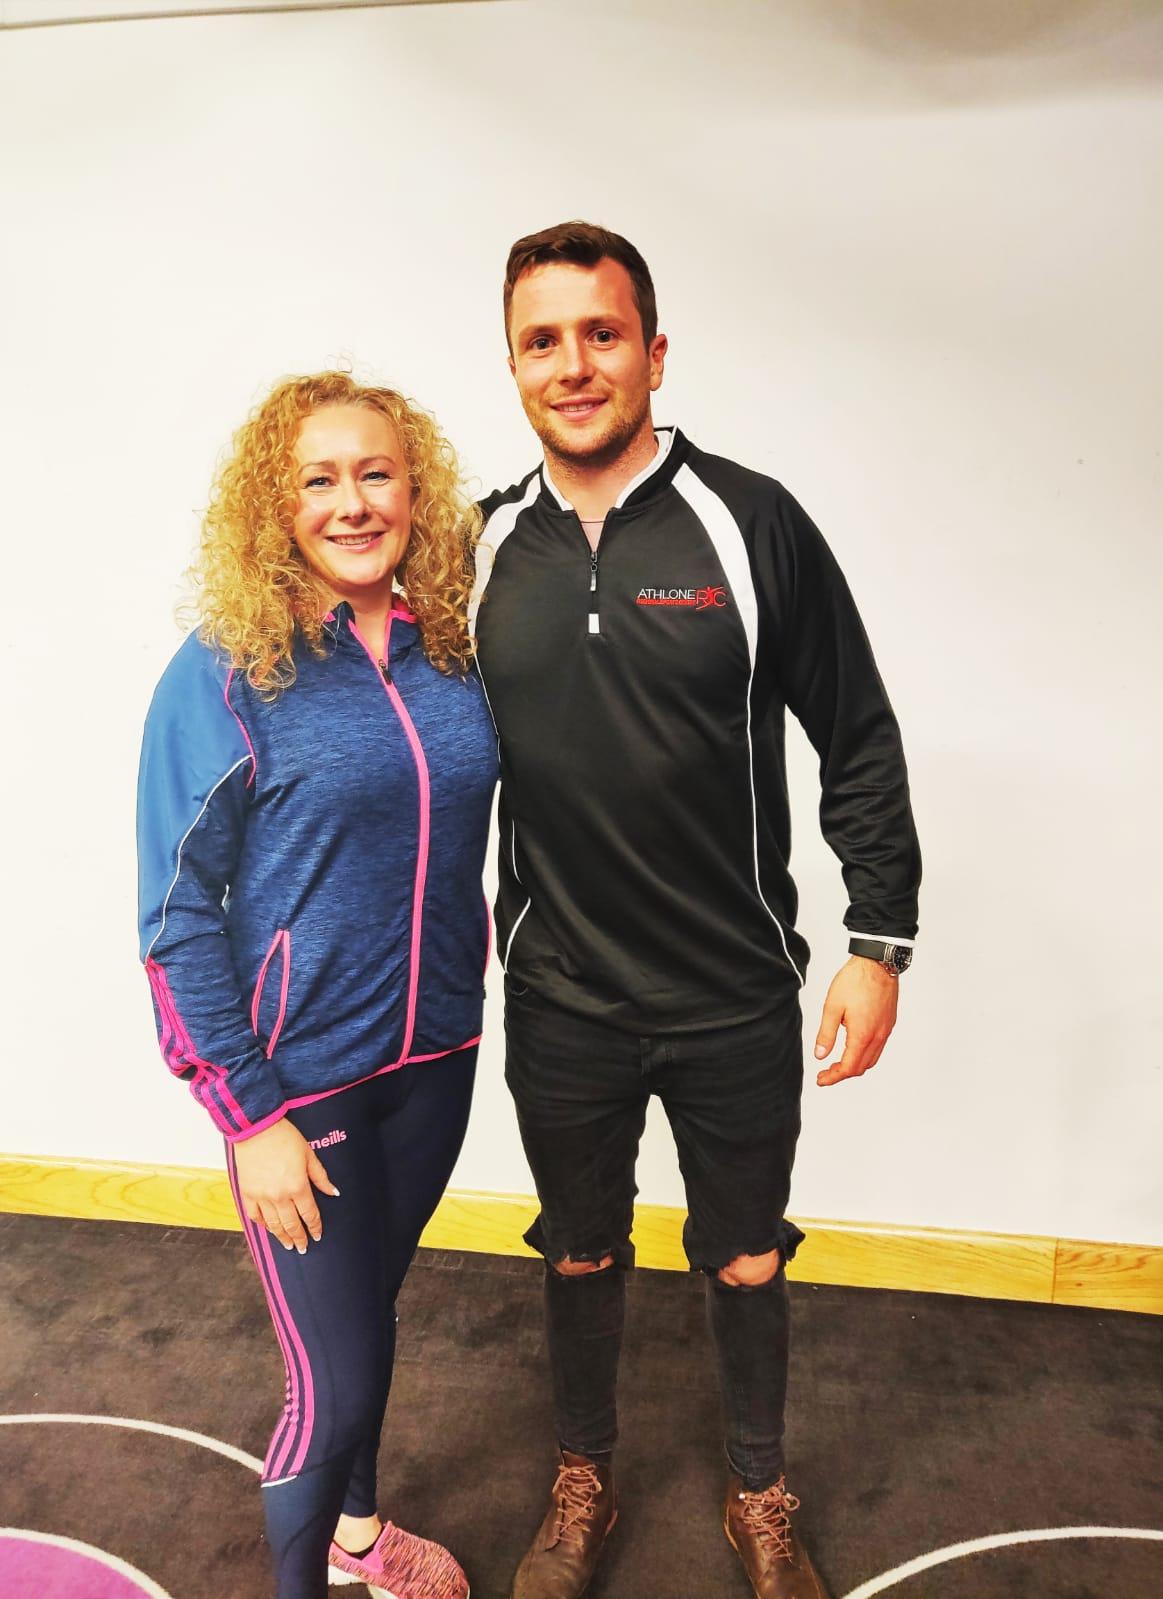 Olive Keyes & Jack Carty Pro Rugby